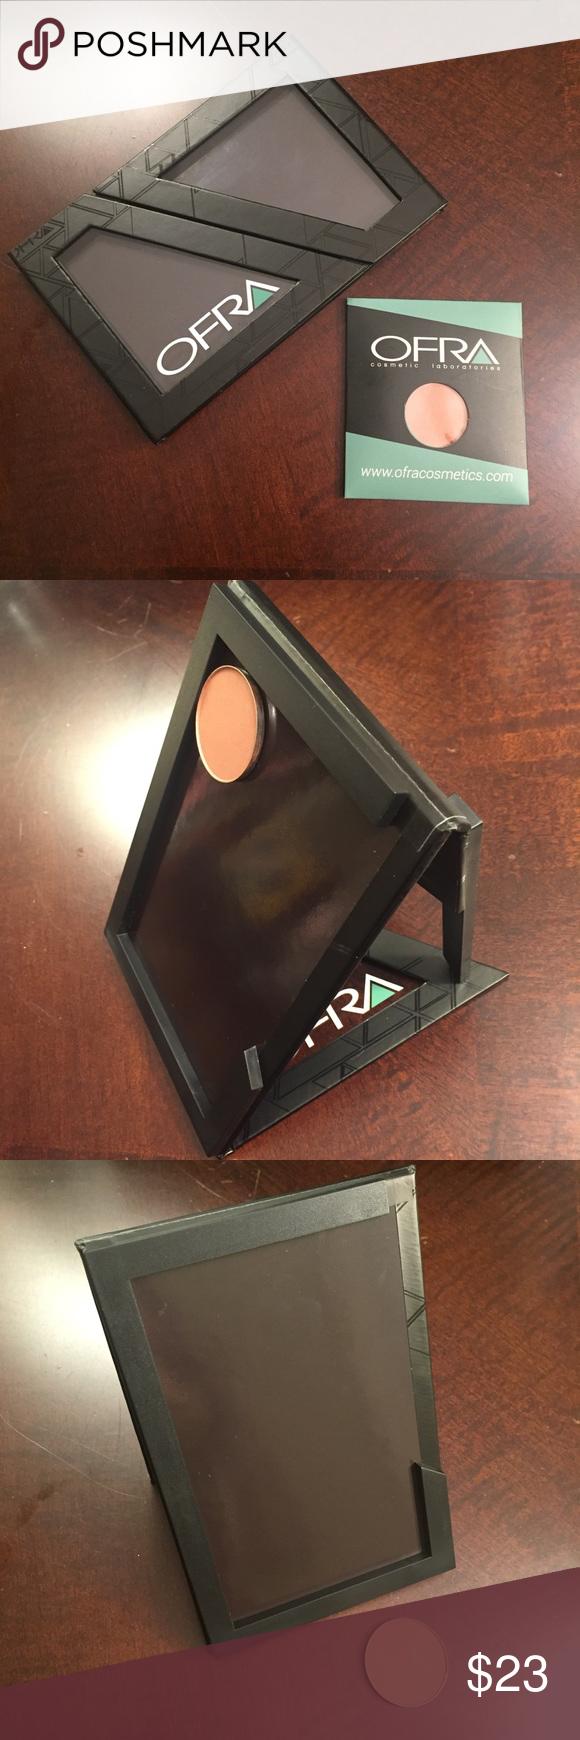 OFRA Cosmetics Mini PopUp Palette + Blush Pan Mini size